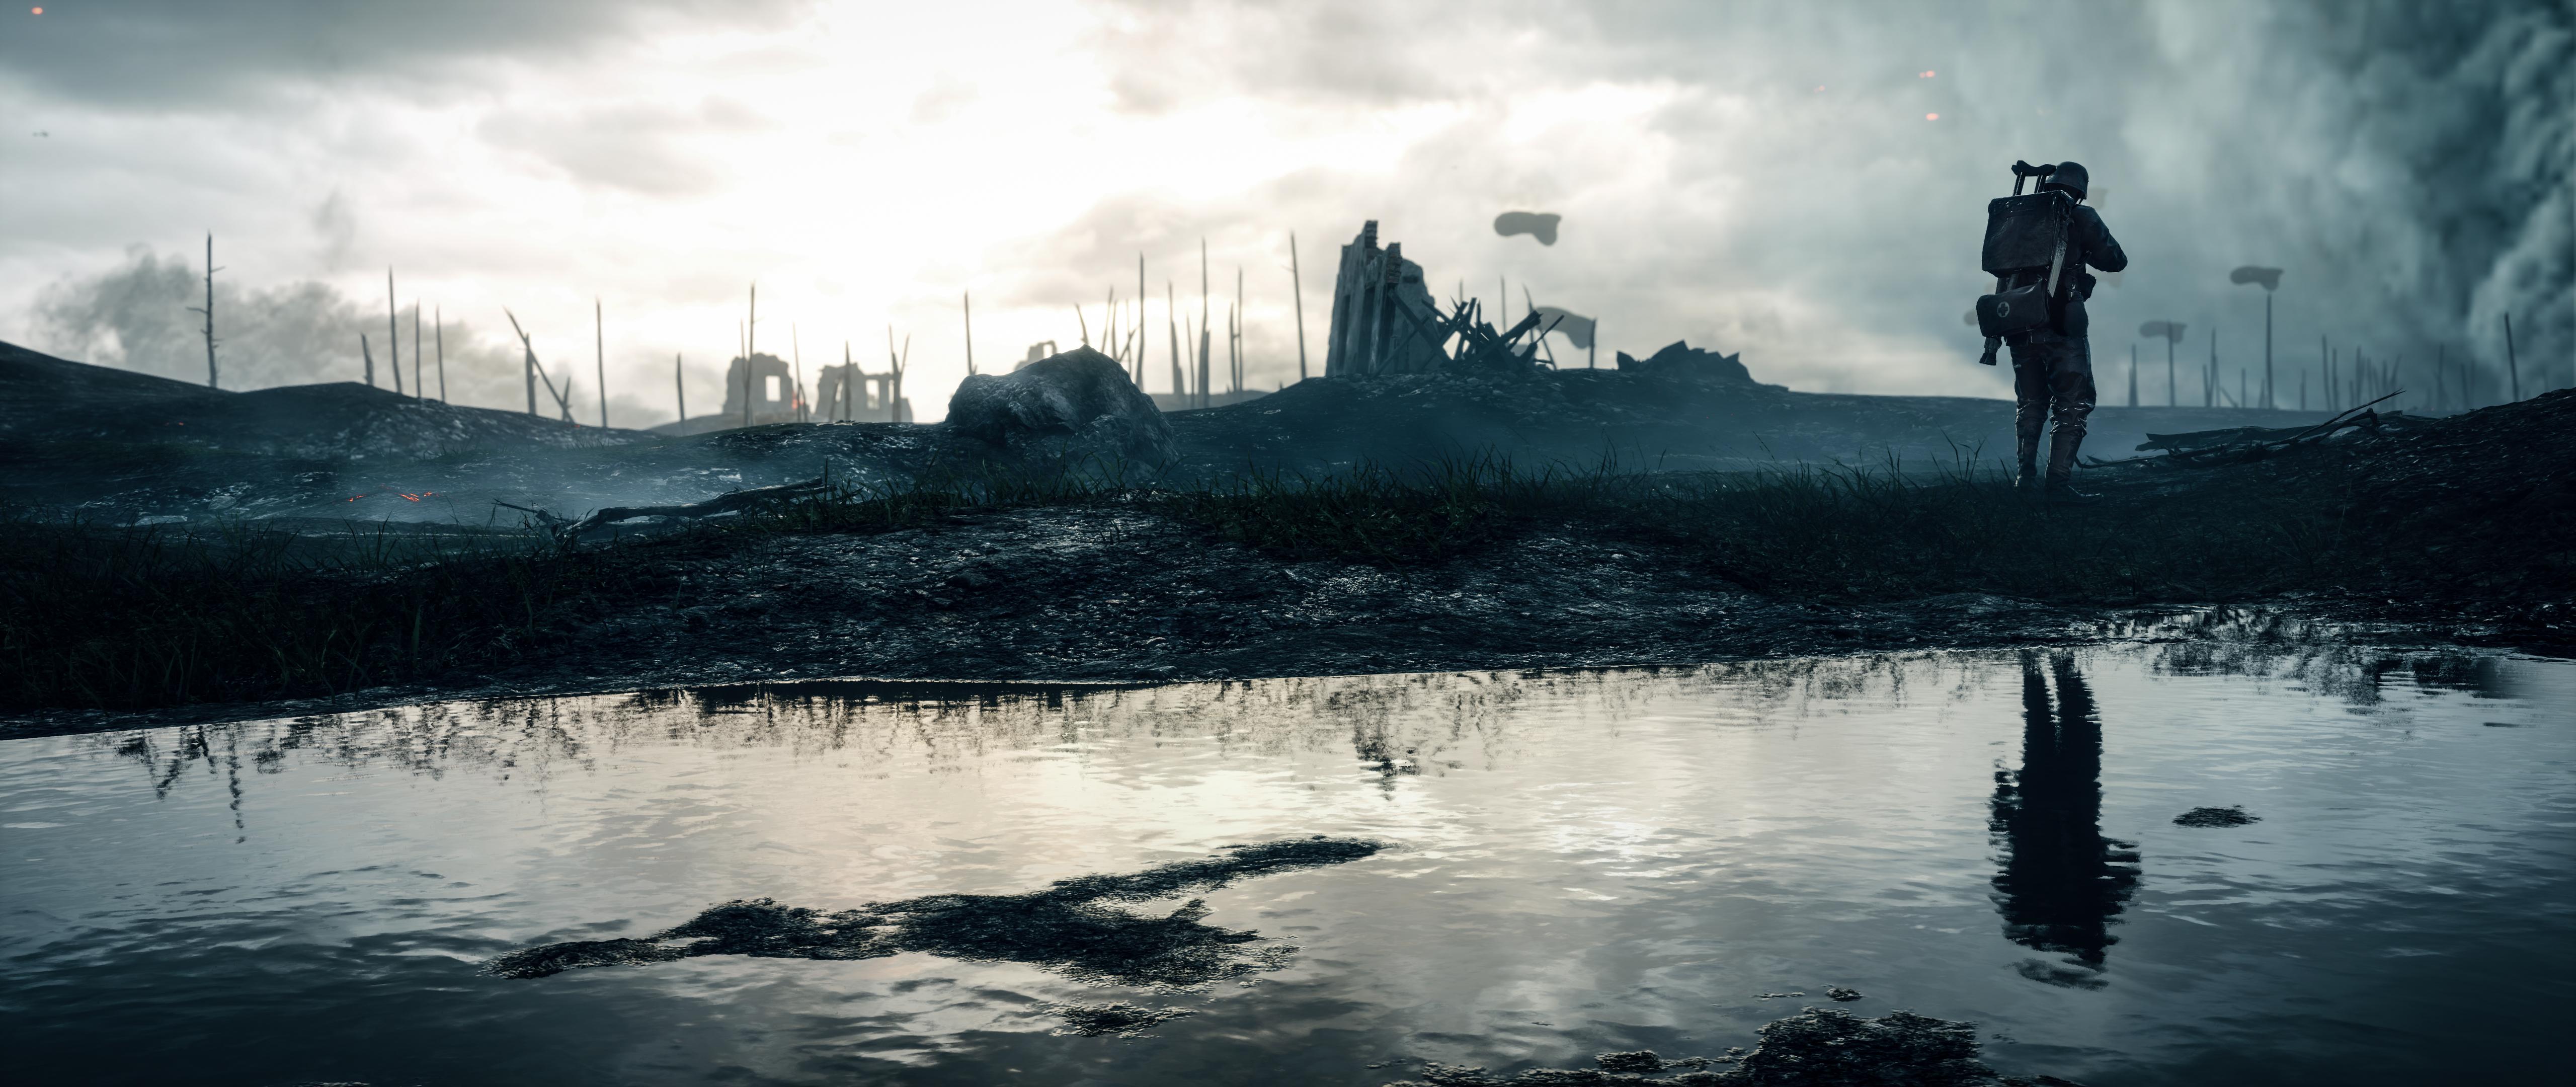 Battlefield 1 4k Ultra Tapeta Hd: Battlefield 1 4k Ultra HD Papel De Parede And Planos De